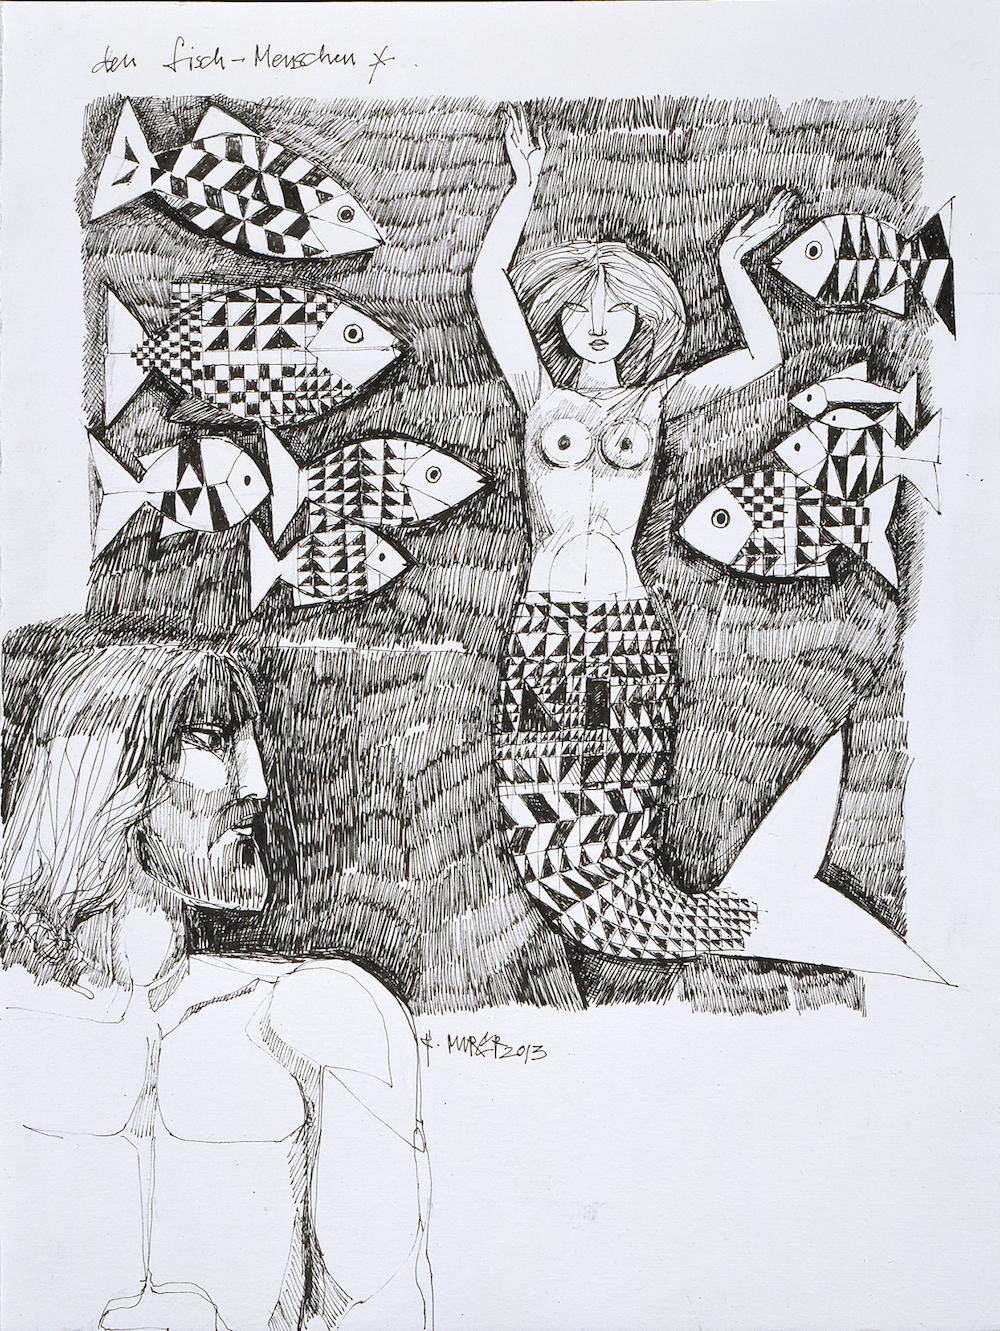 den fisch-menschen, Nr. 1233